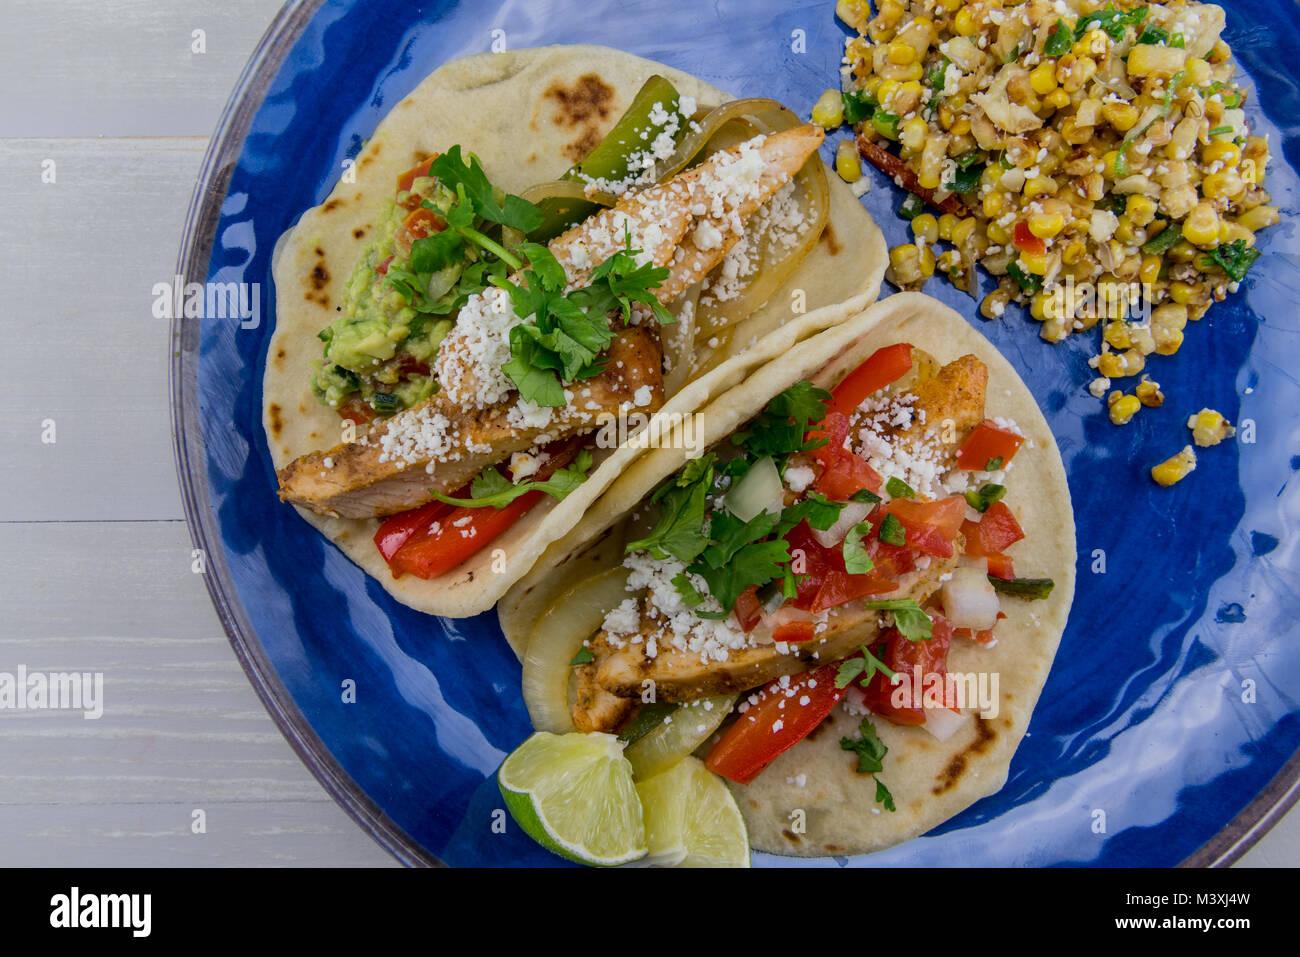 Fajitas and Mexican Street Corn on Blue Plate - Stock Image